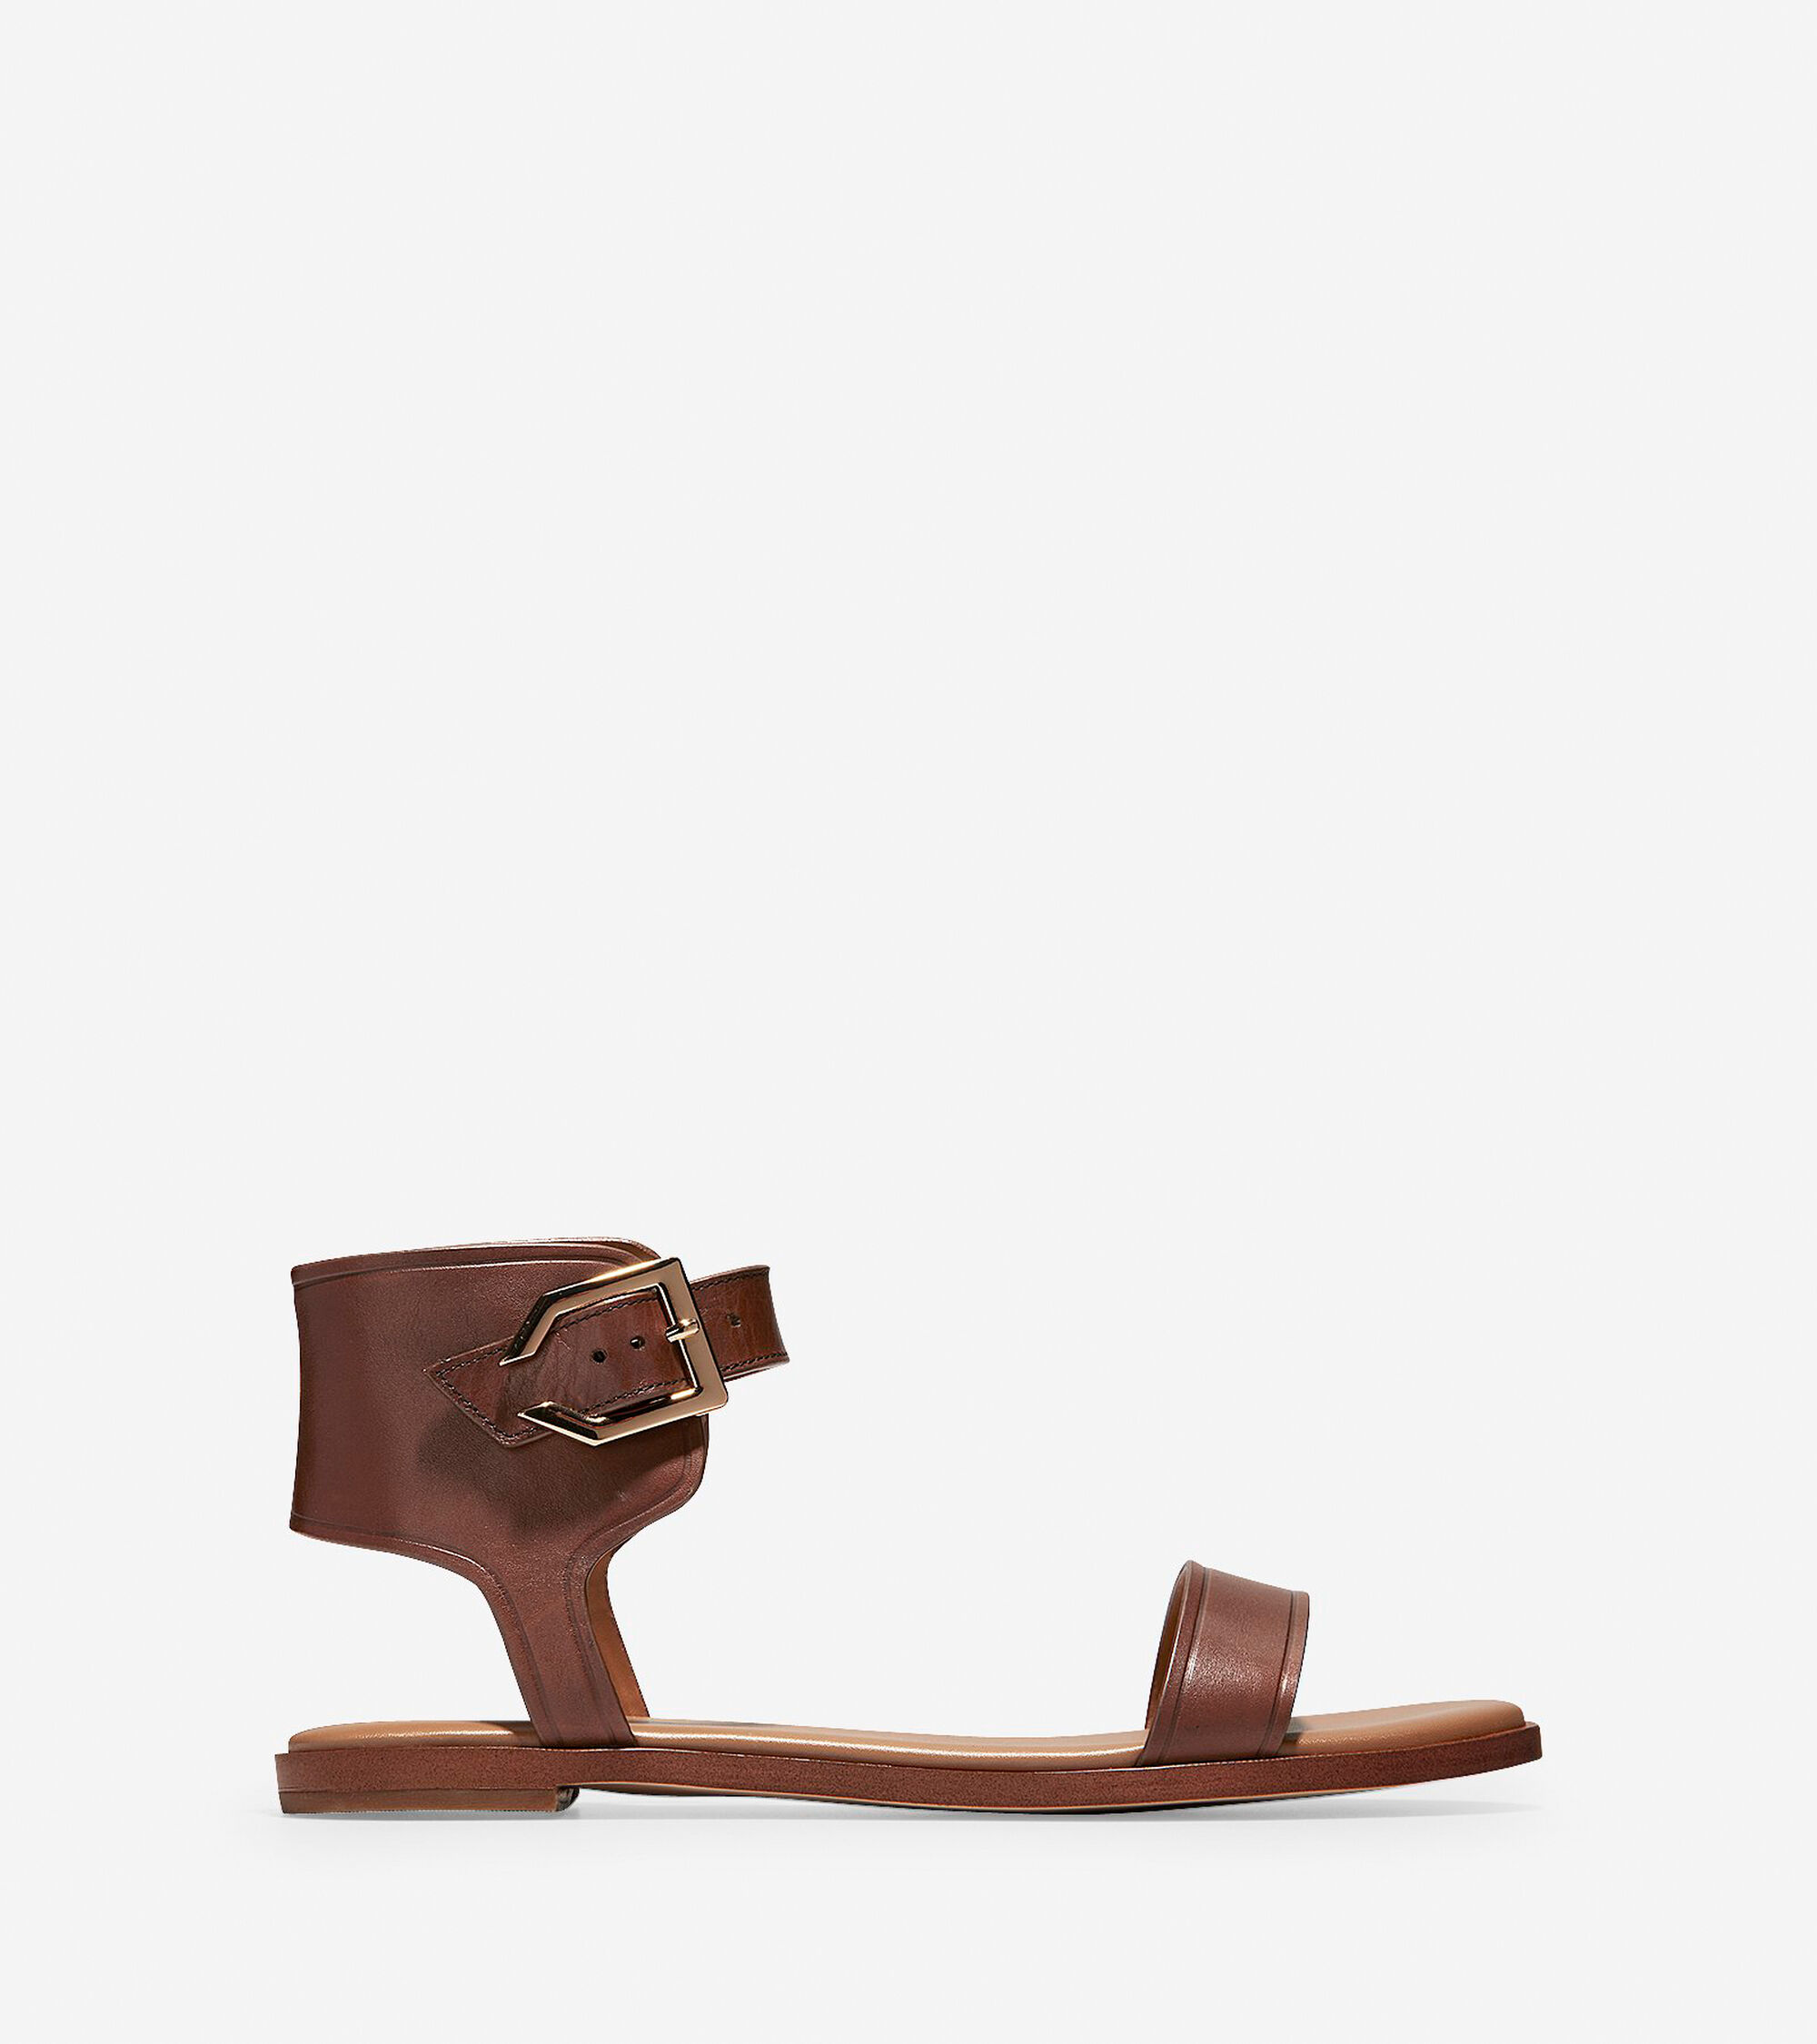 8f9034f7b1f0 Women s Anica Cuff Sandals in Woodbury